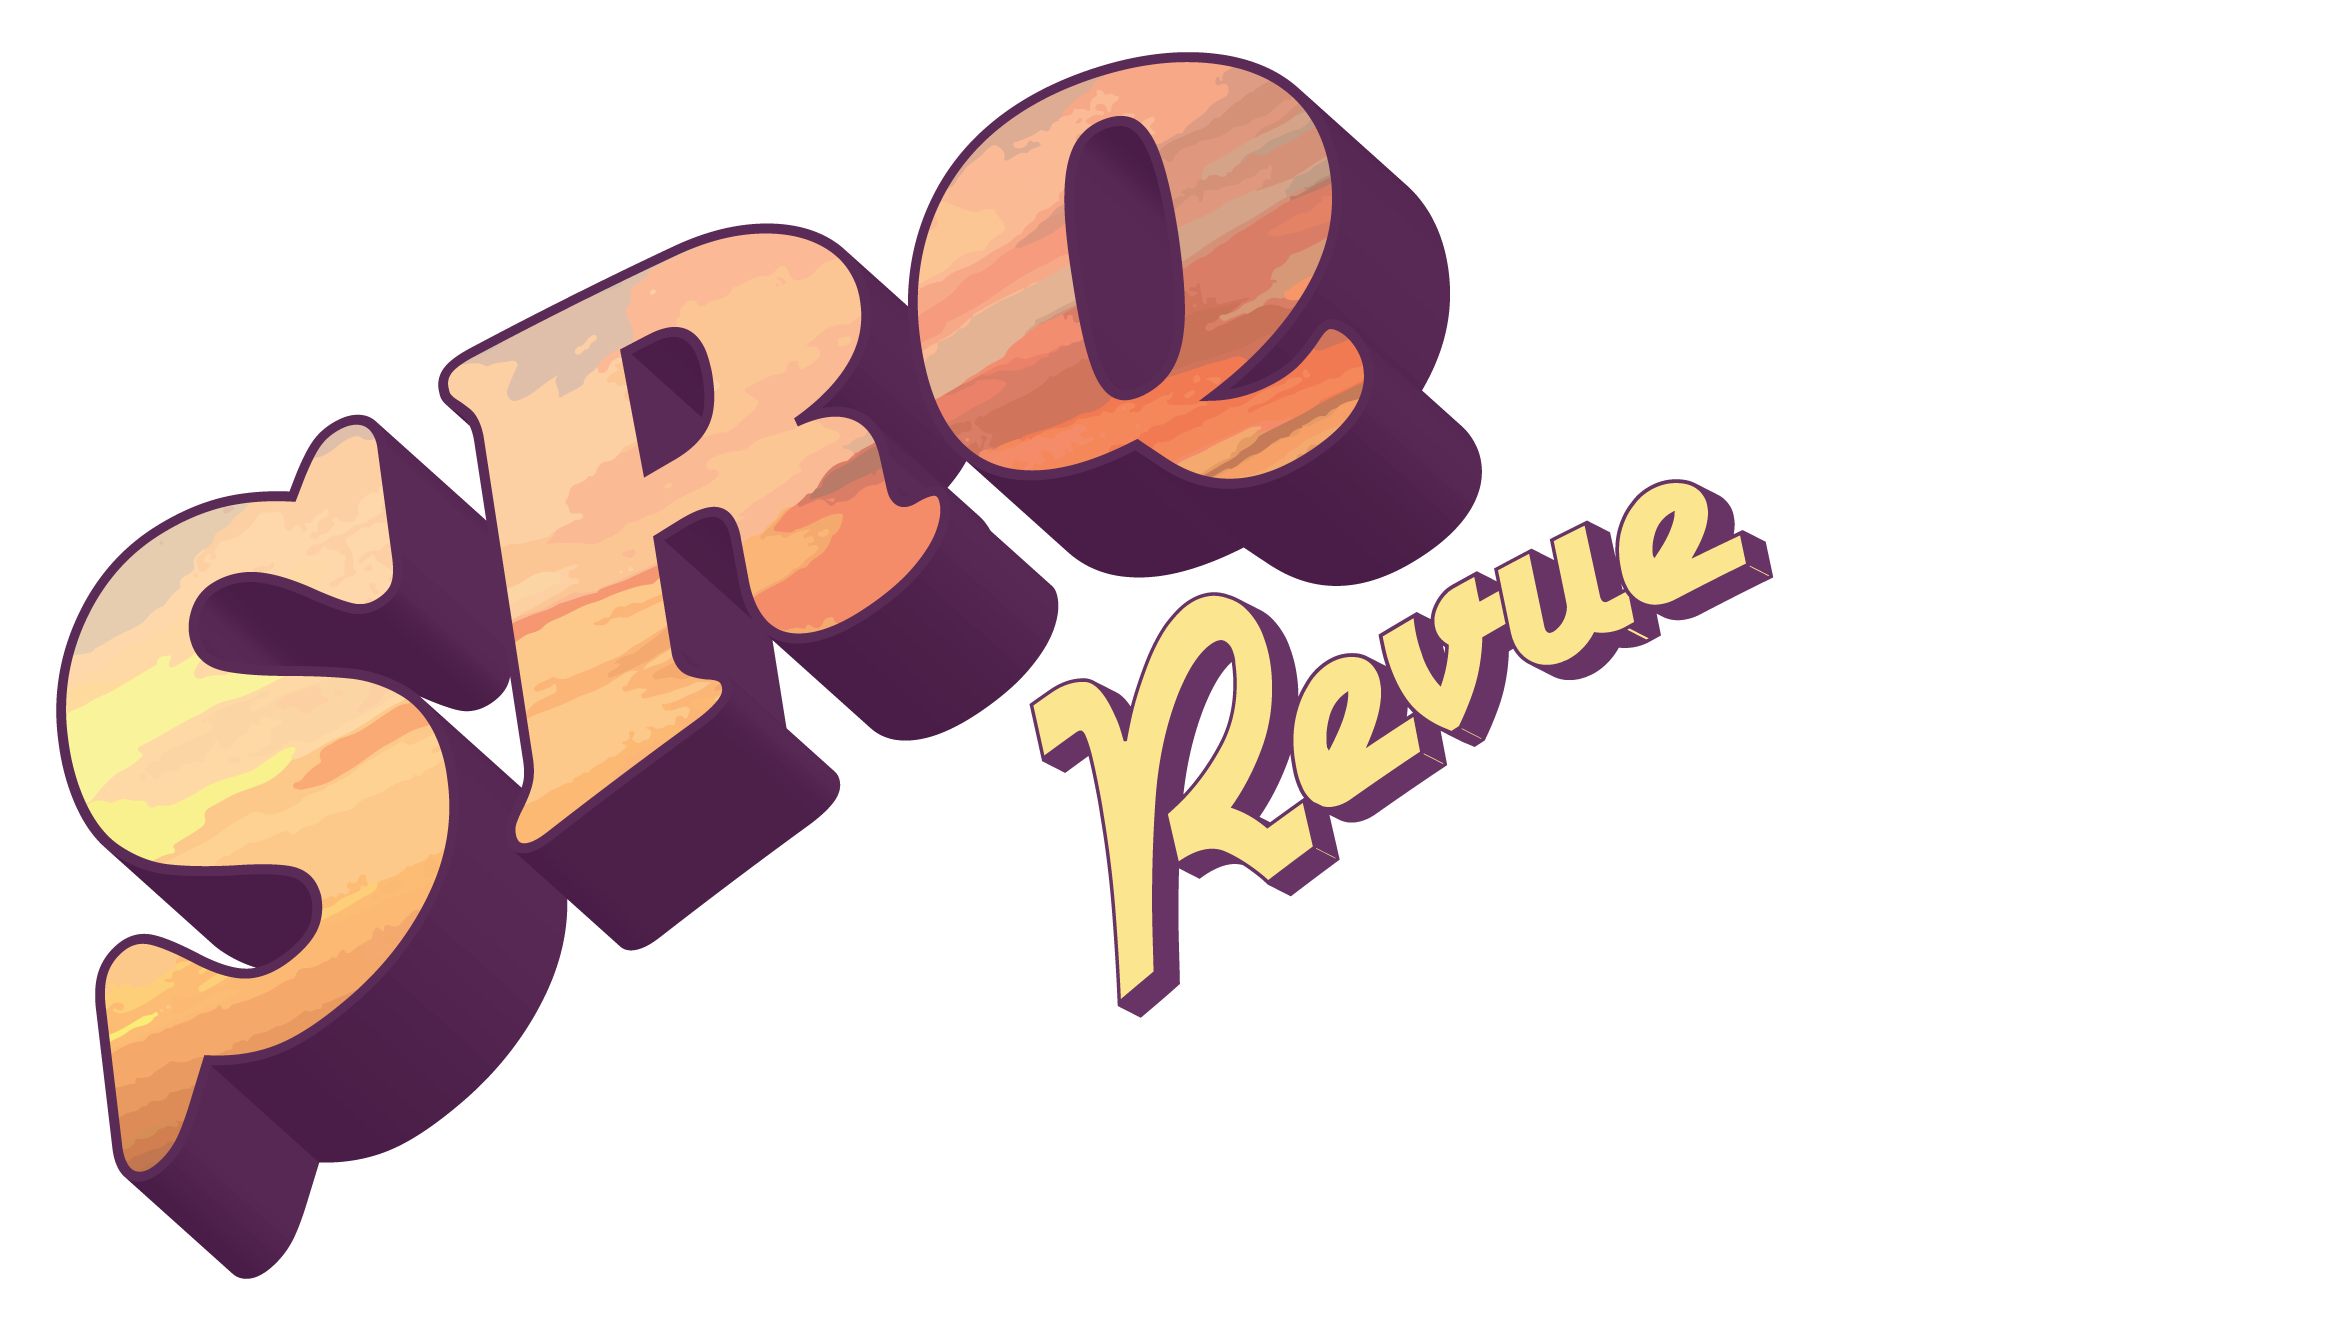 SRQ Revue - Friday, May 10, 2019